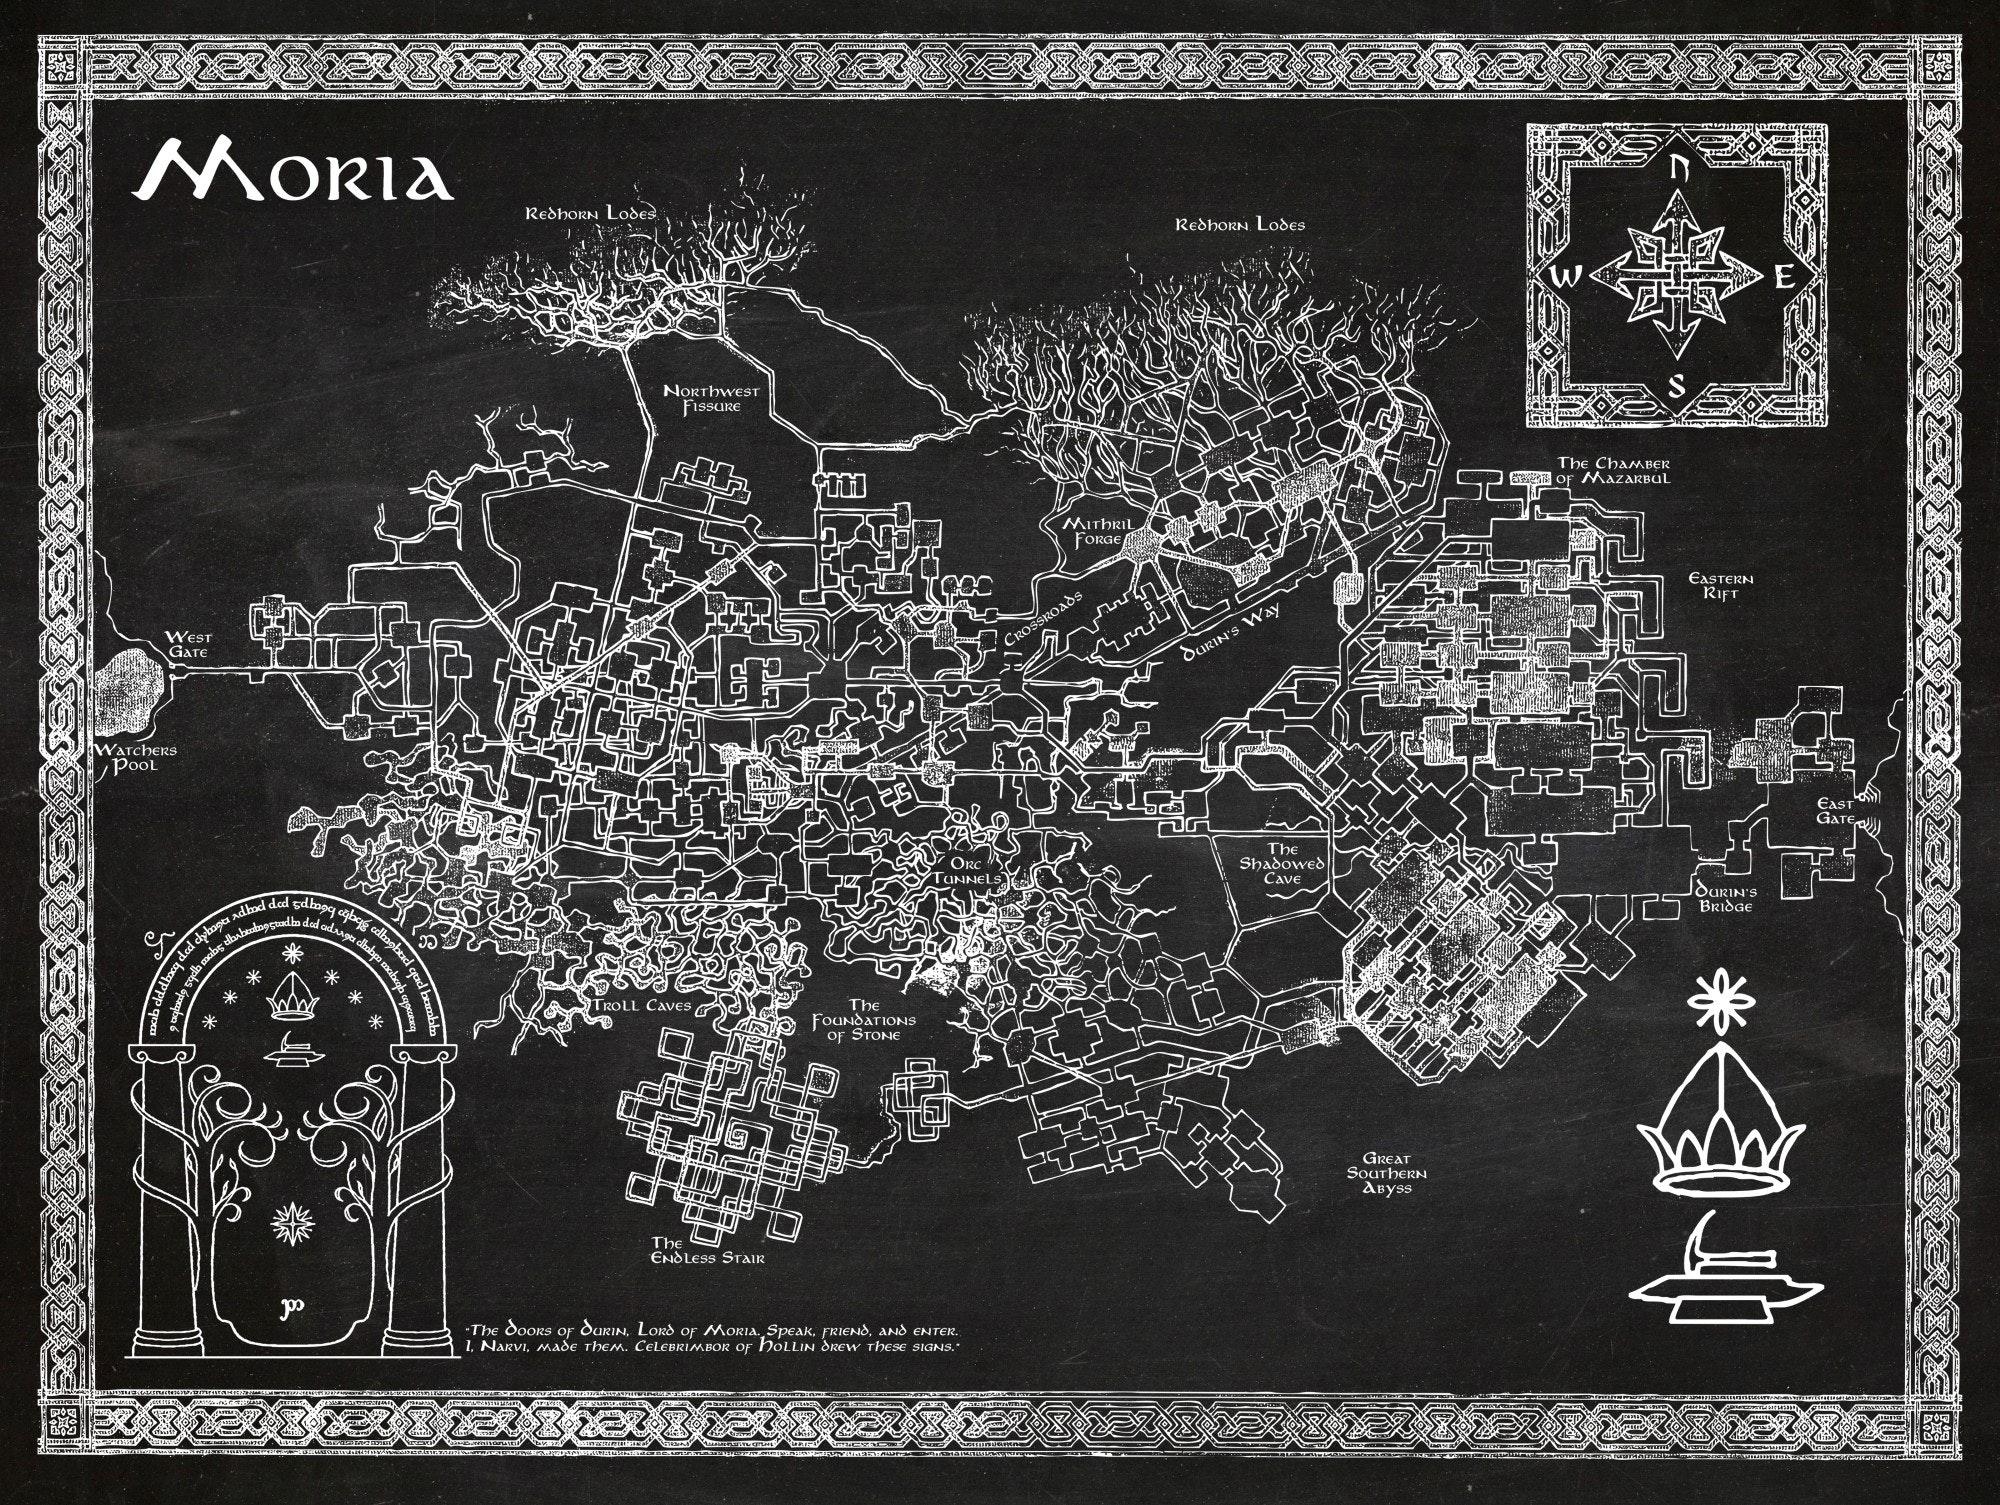 LOTR - Moria Map